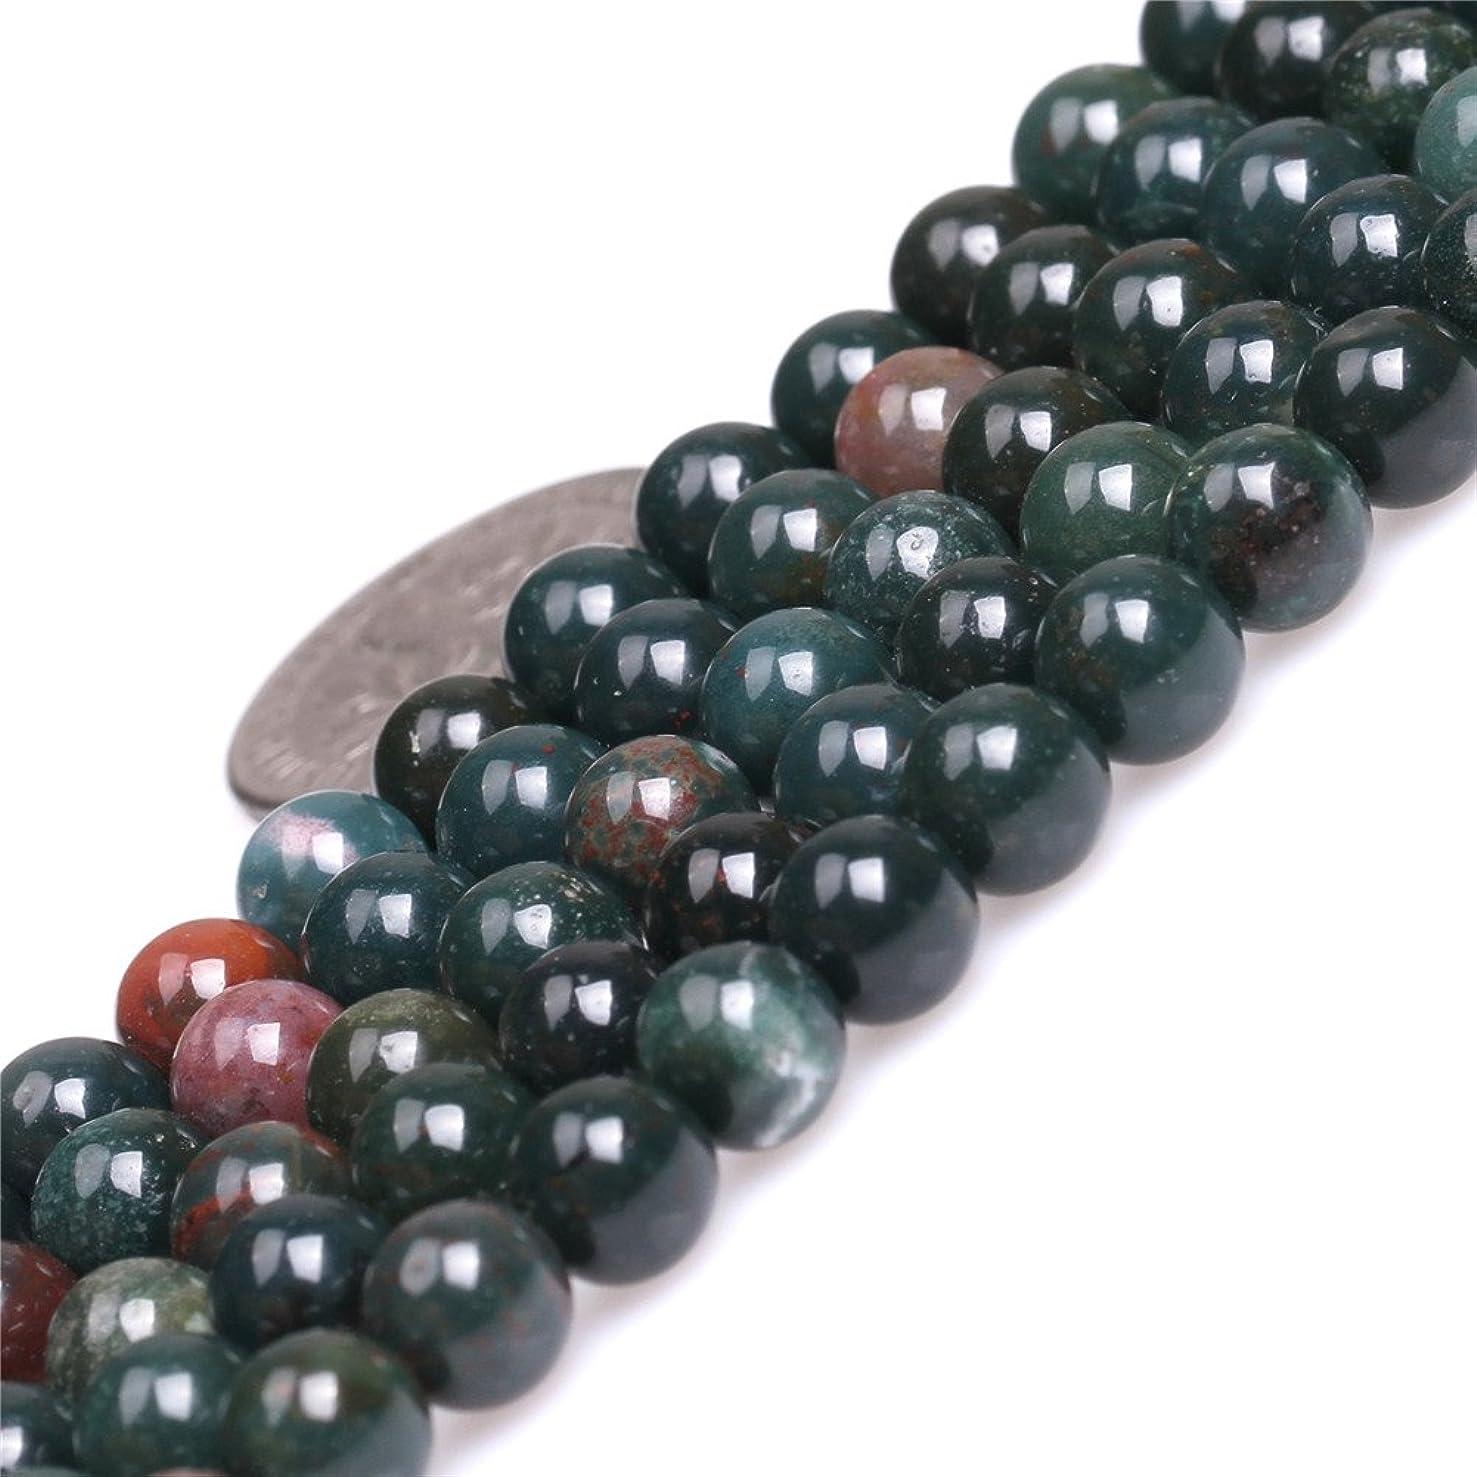 Blood Stone Beads for Jewelry Making Natural Gemstone Semi Precious 6mm Round Dark Green 15